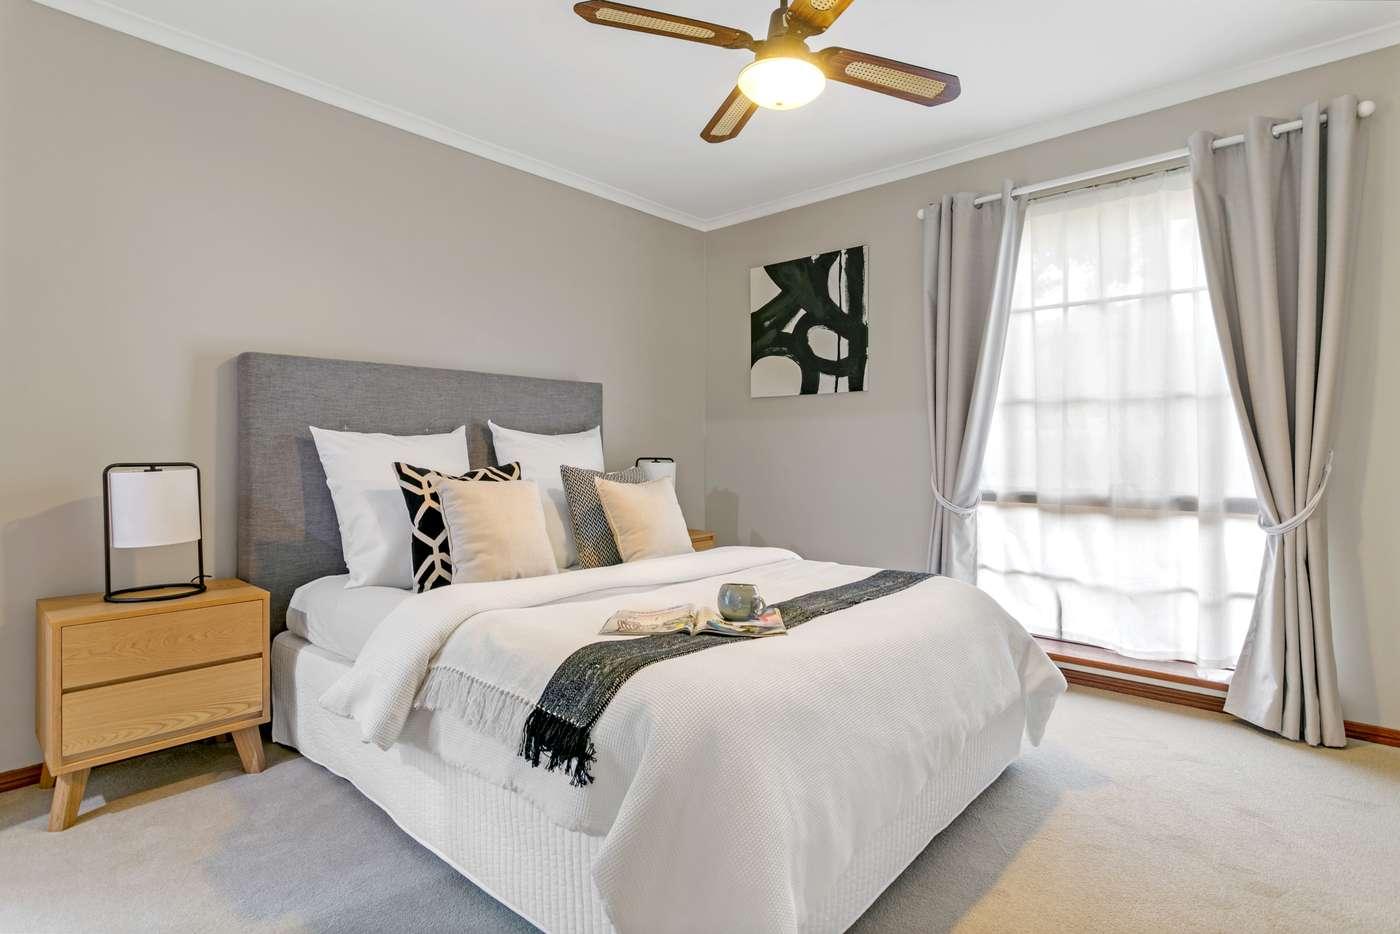 Sixth view of Homely house listing, 16 Nash Lane, Morphett Vale SA 5162